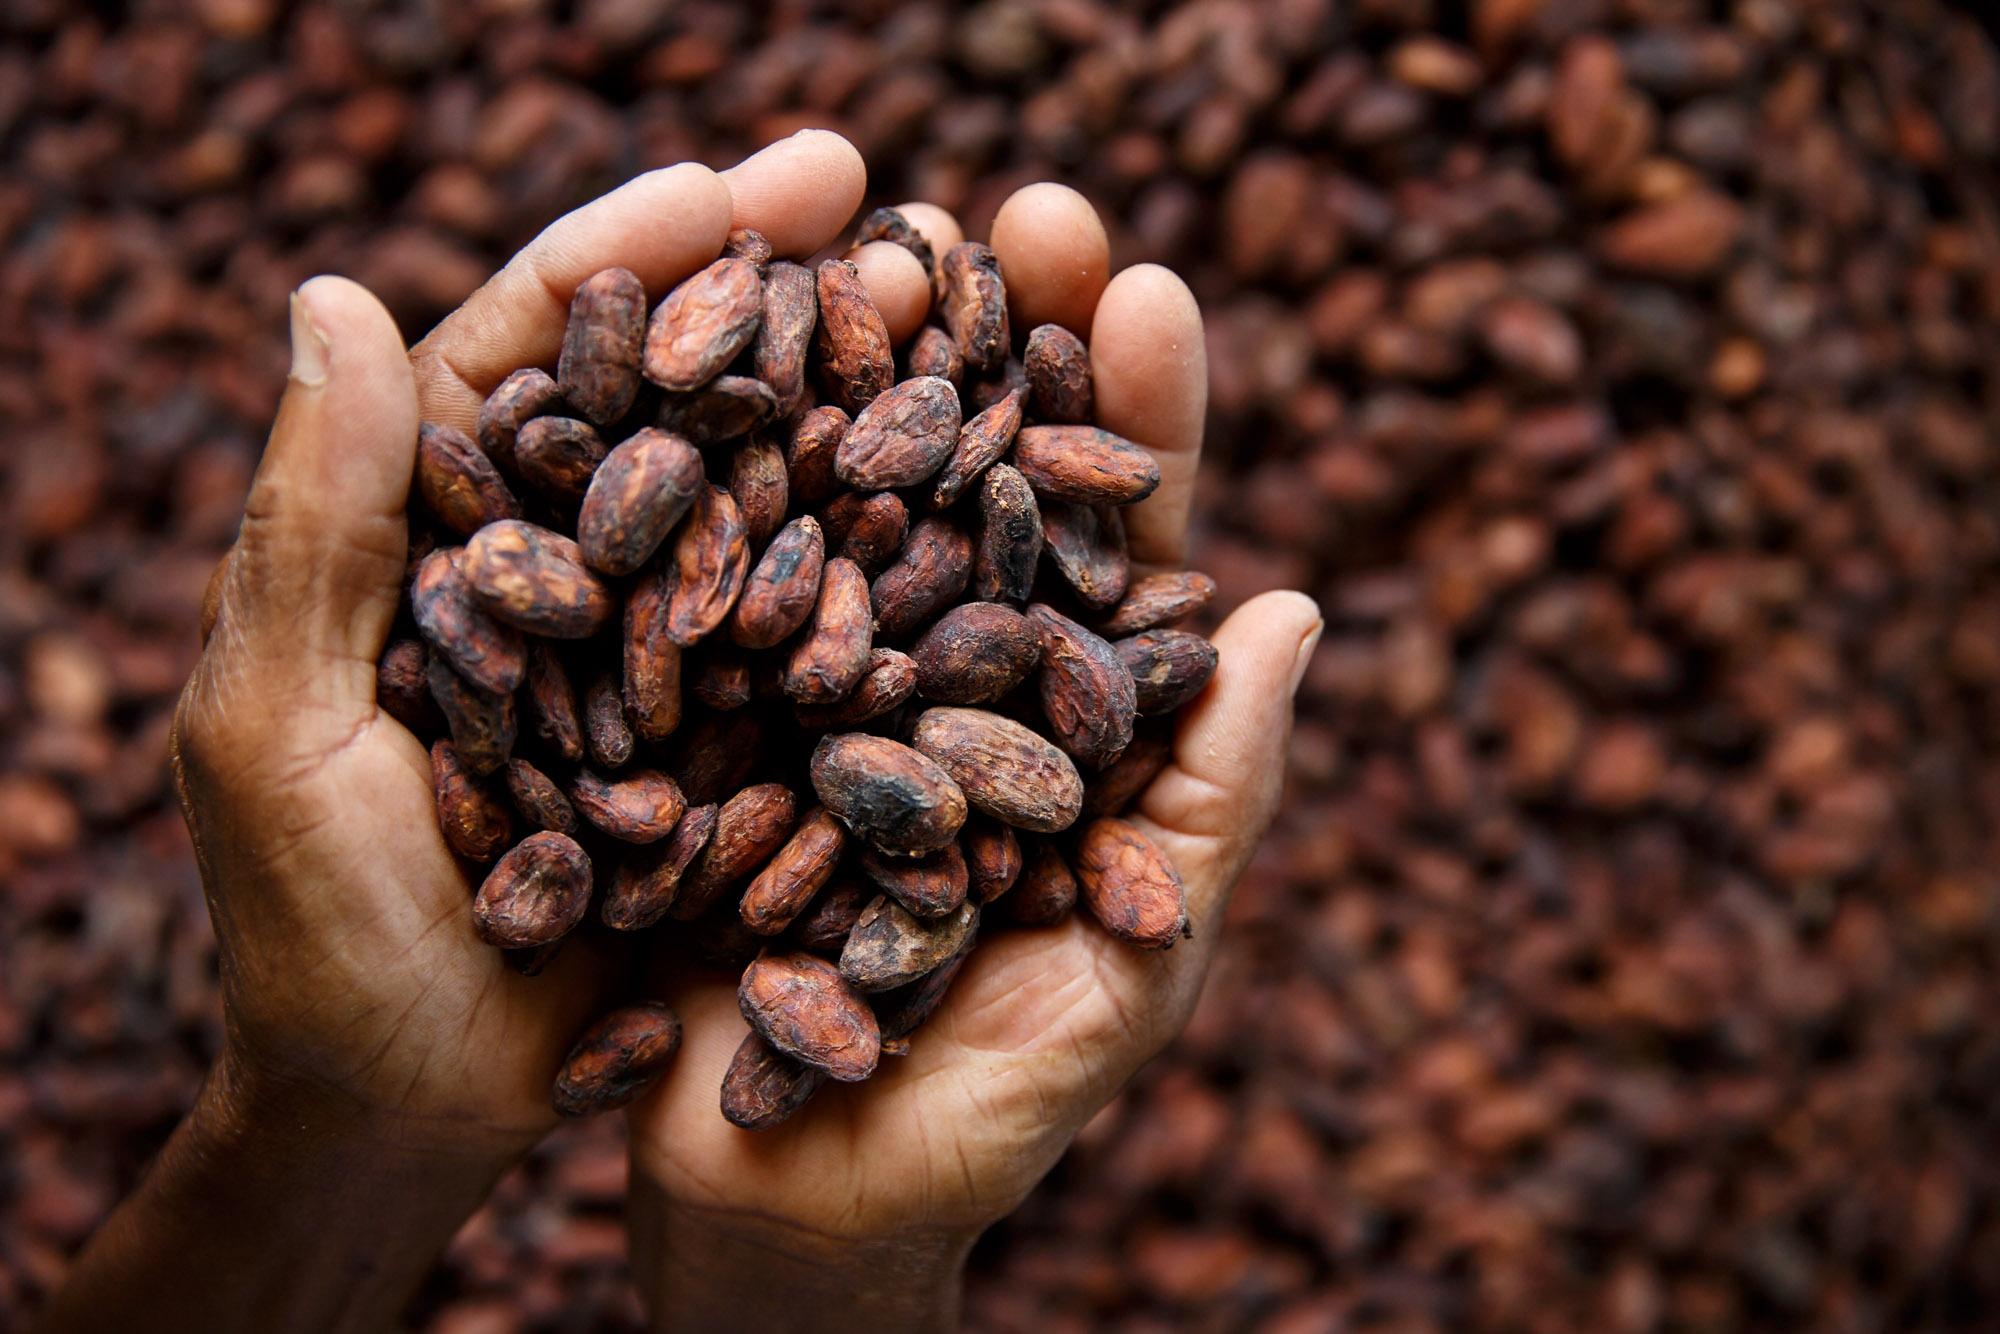 GRENADA - MARINE CONSERVATION, ORGANIC CHOCOLATE…AND RUM